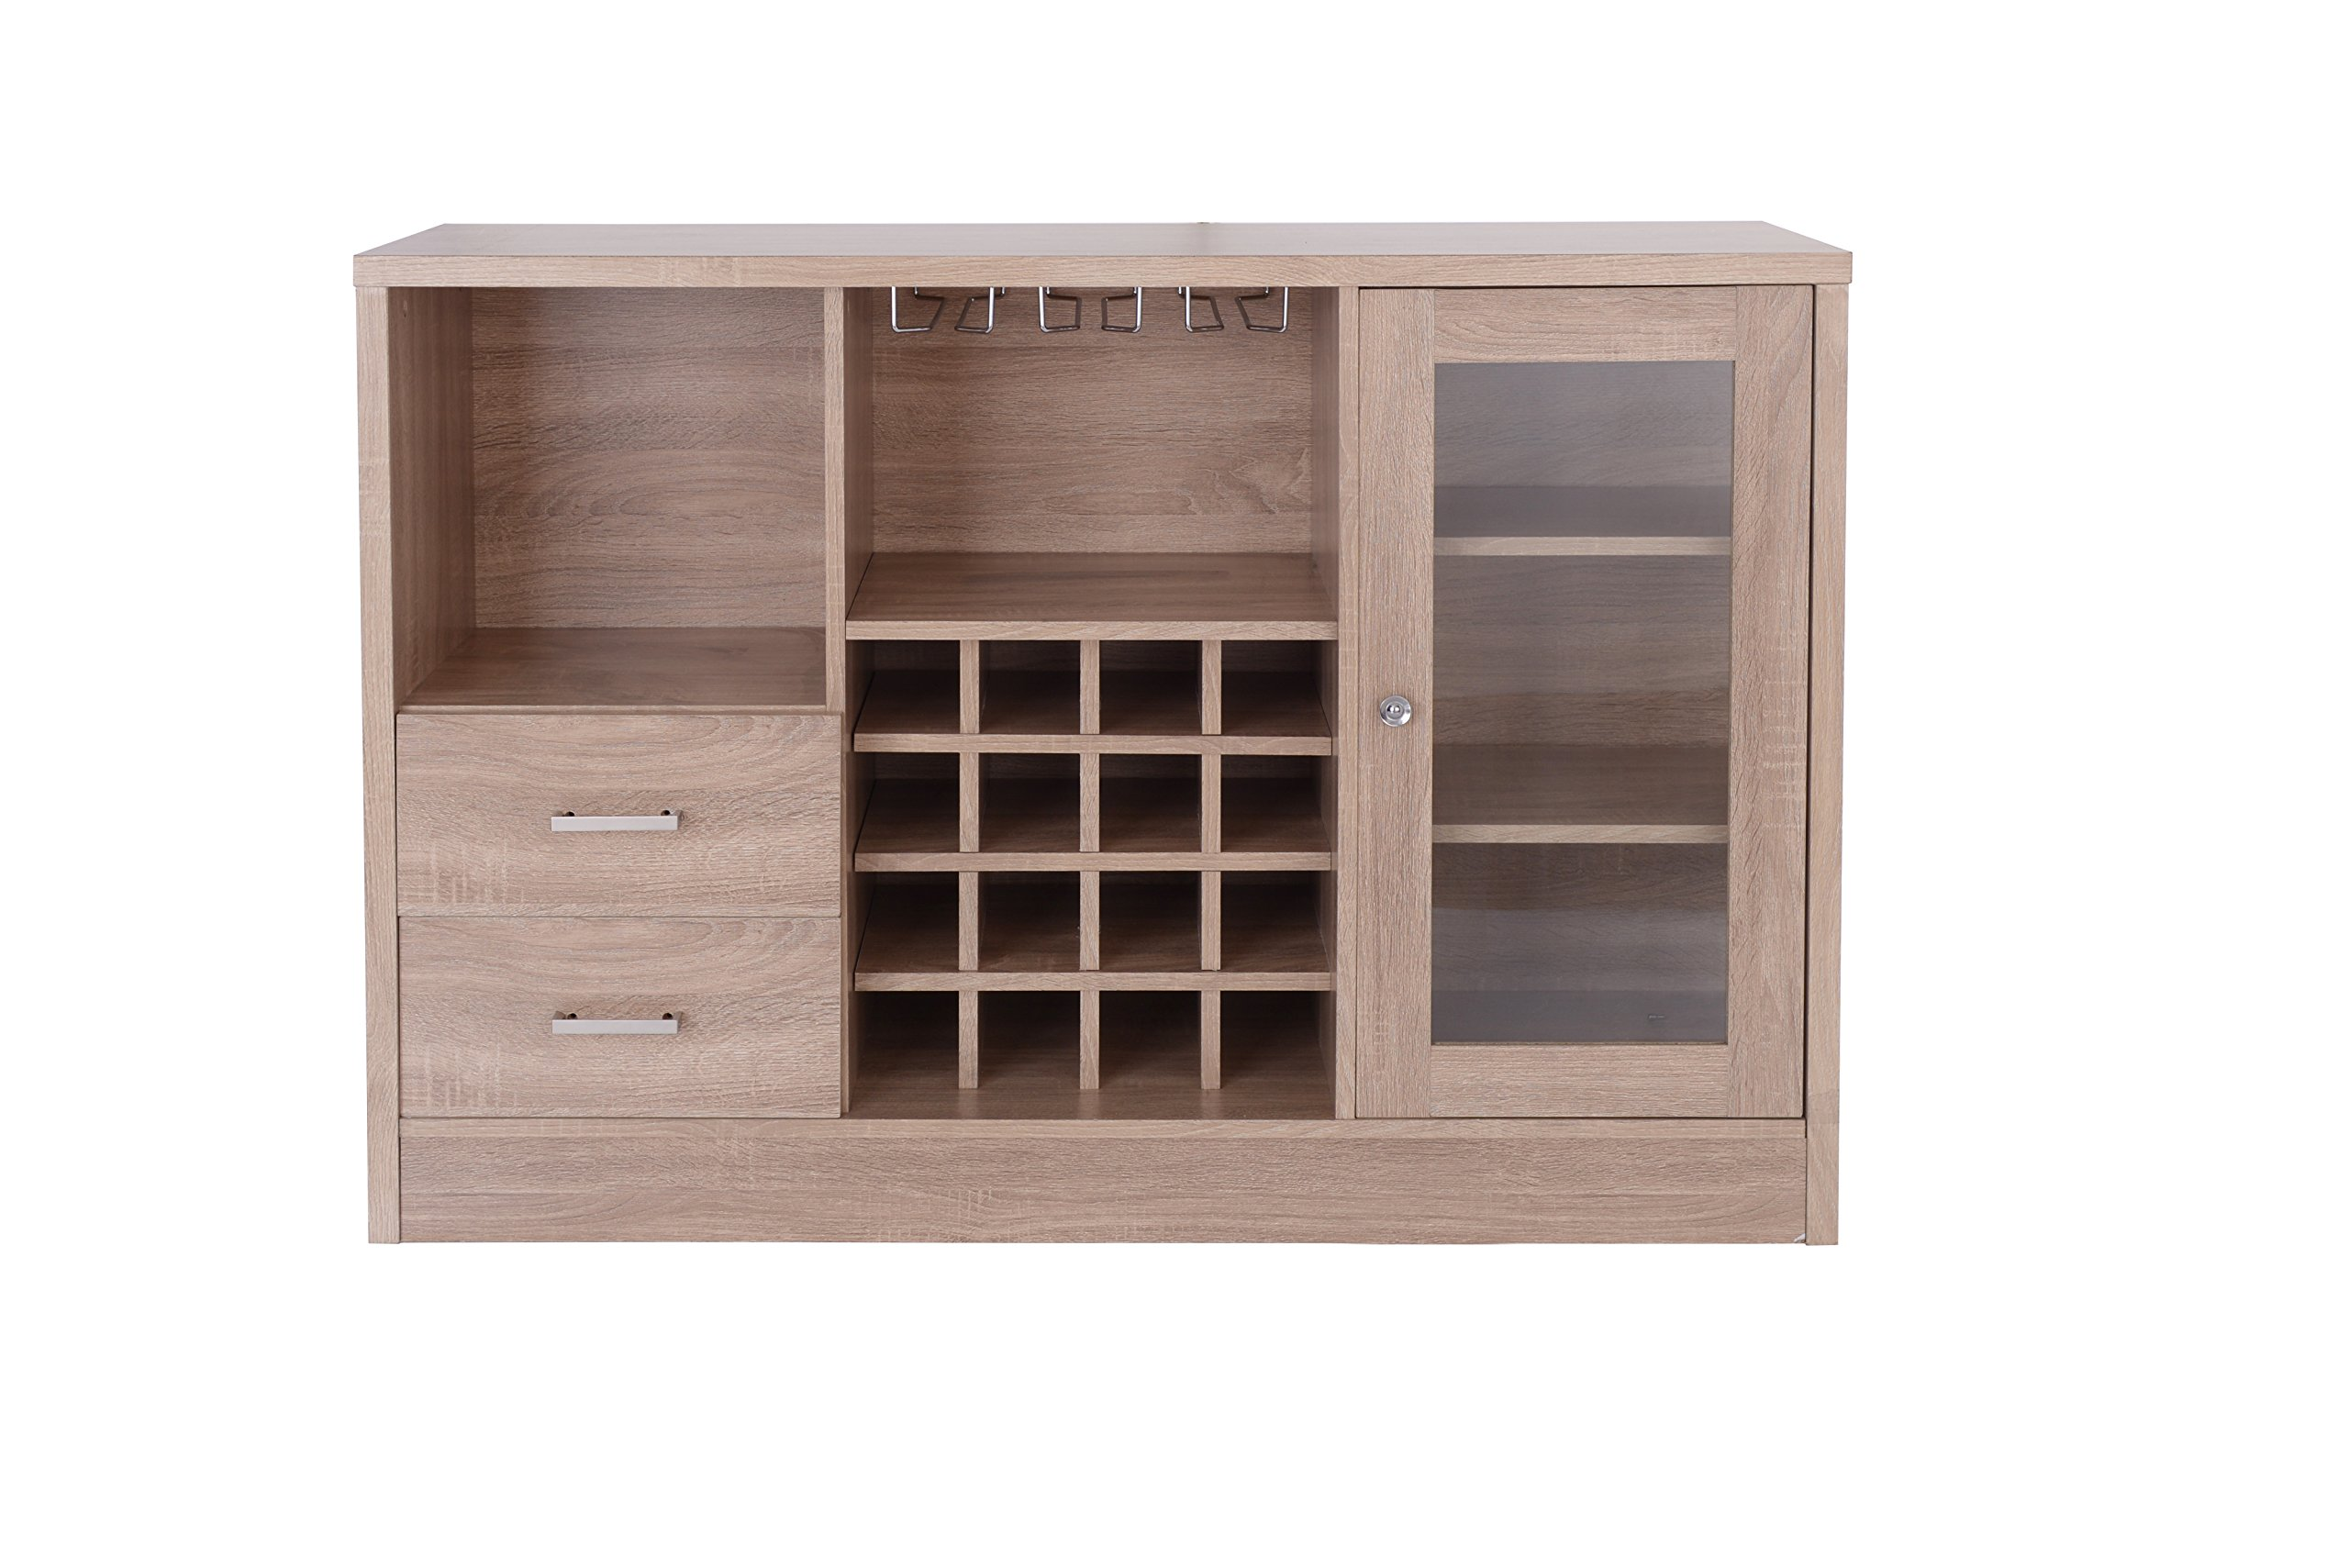 Acme Furniture 72635 Joice Rustic Oak Server by Acme Furniture (Image #2)